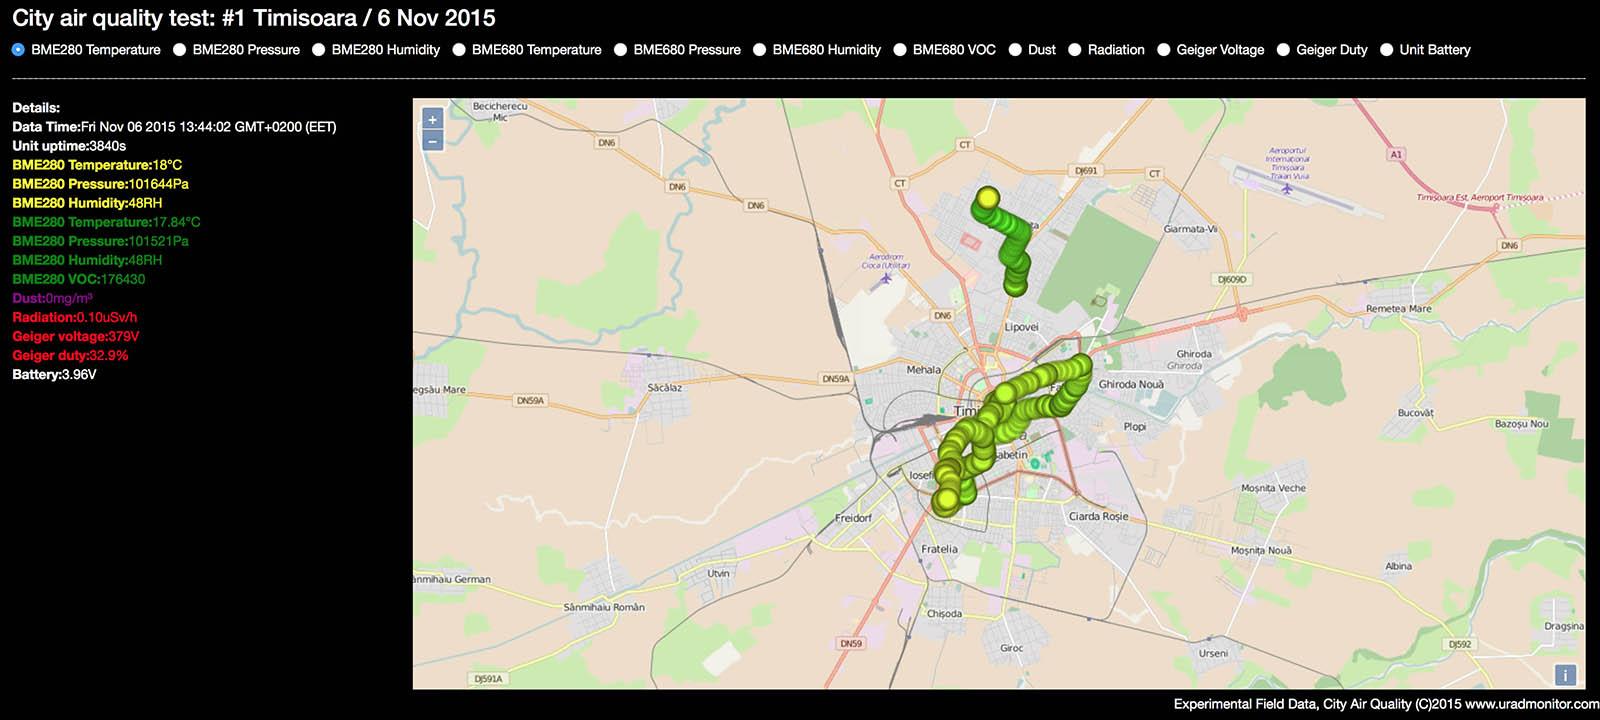 city_airq_webdata_1